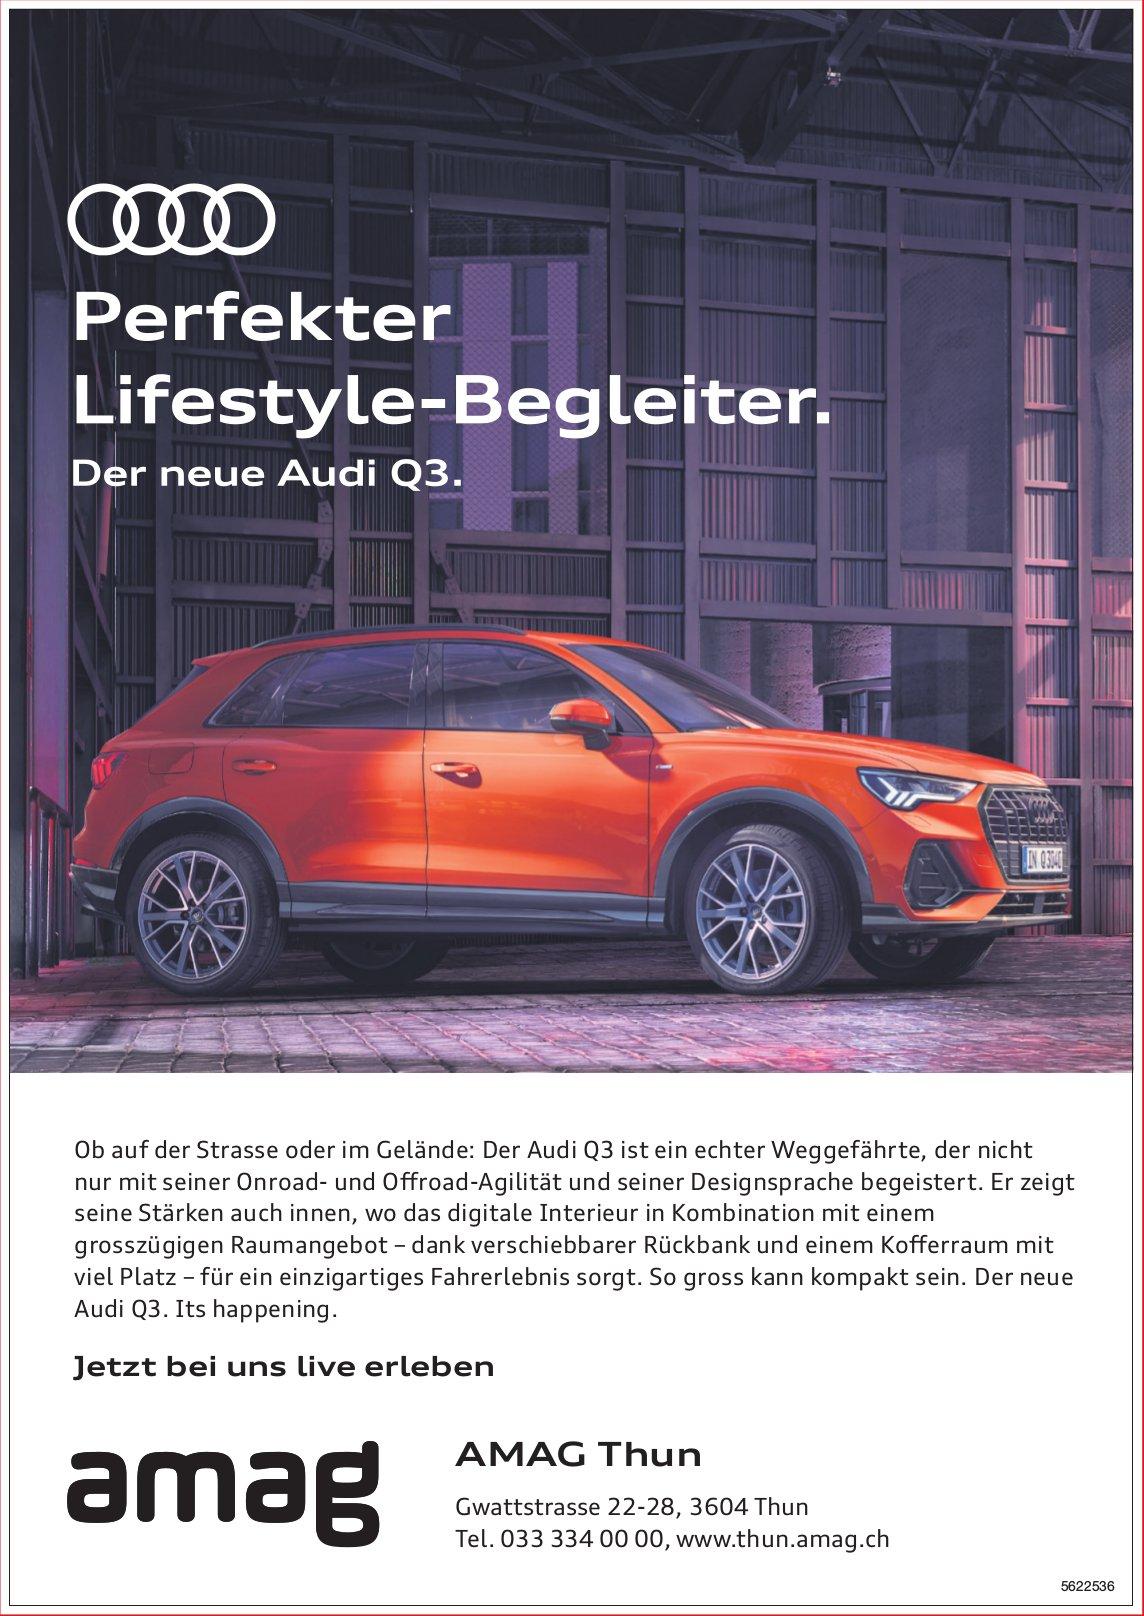 AMAG Thun - Perfekter Lifestyle-Begleiter. Der neue Audi Q3.